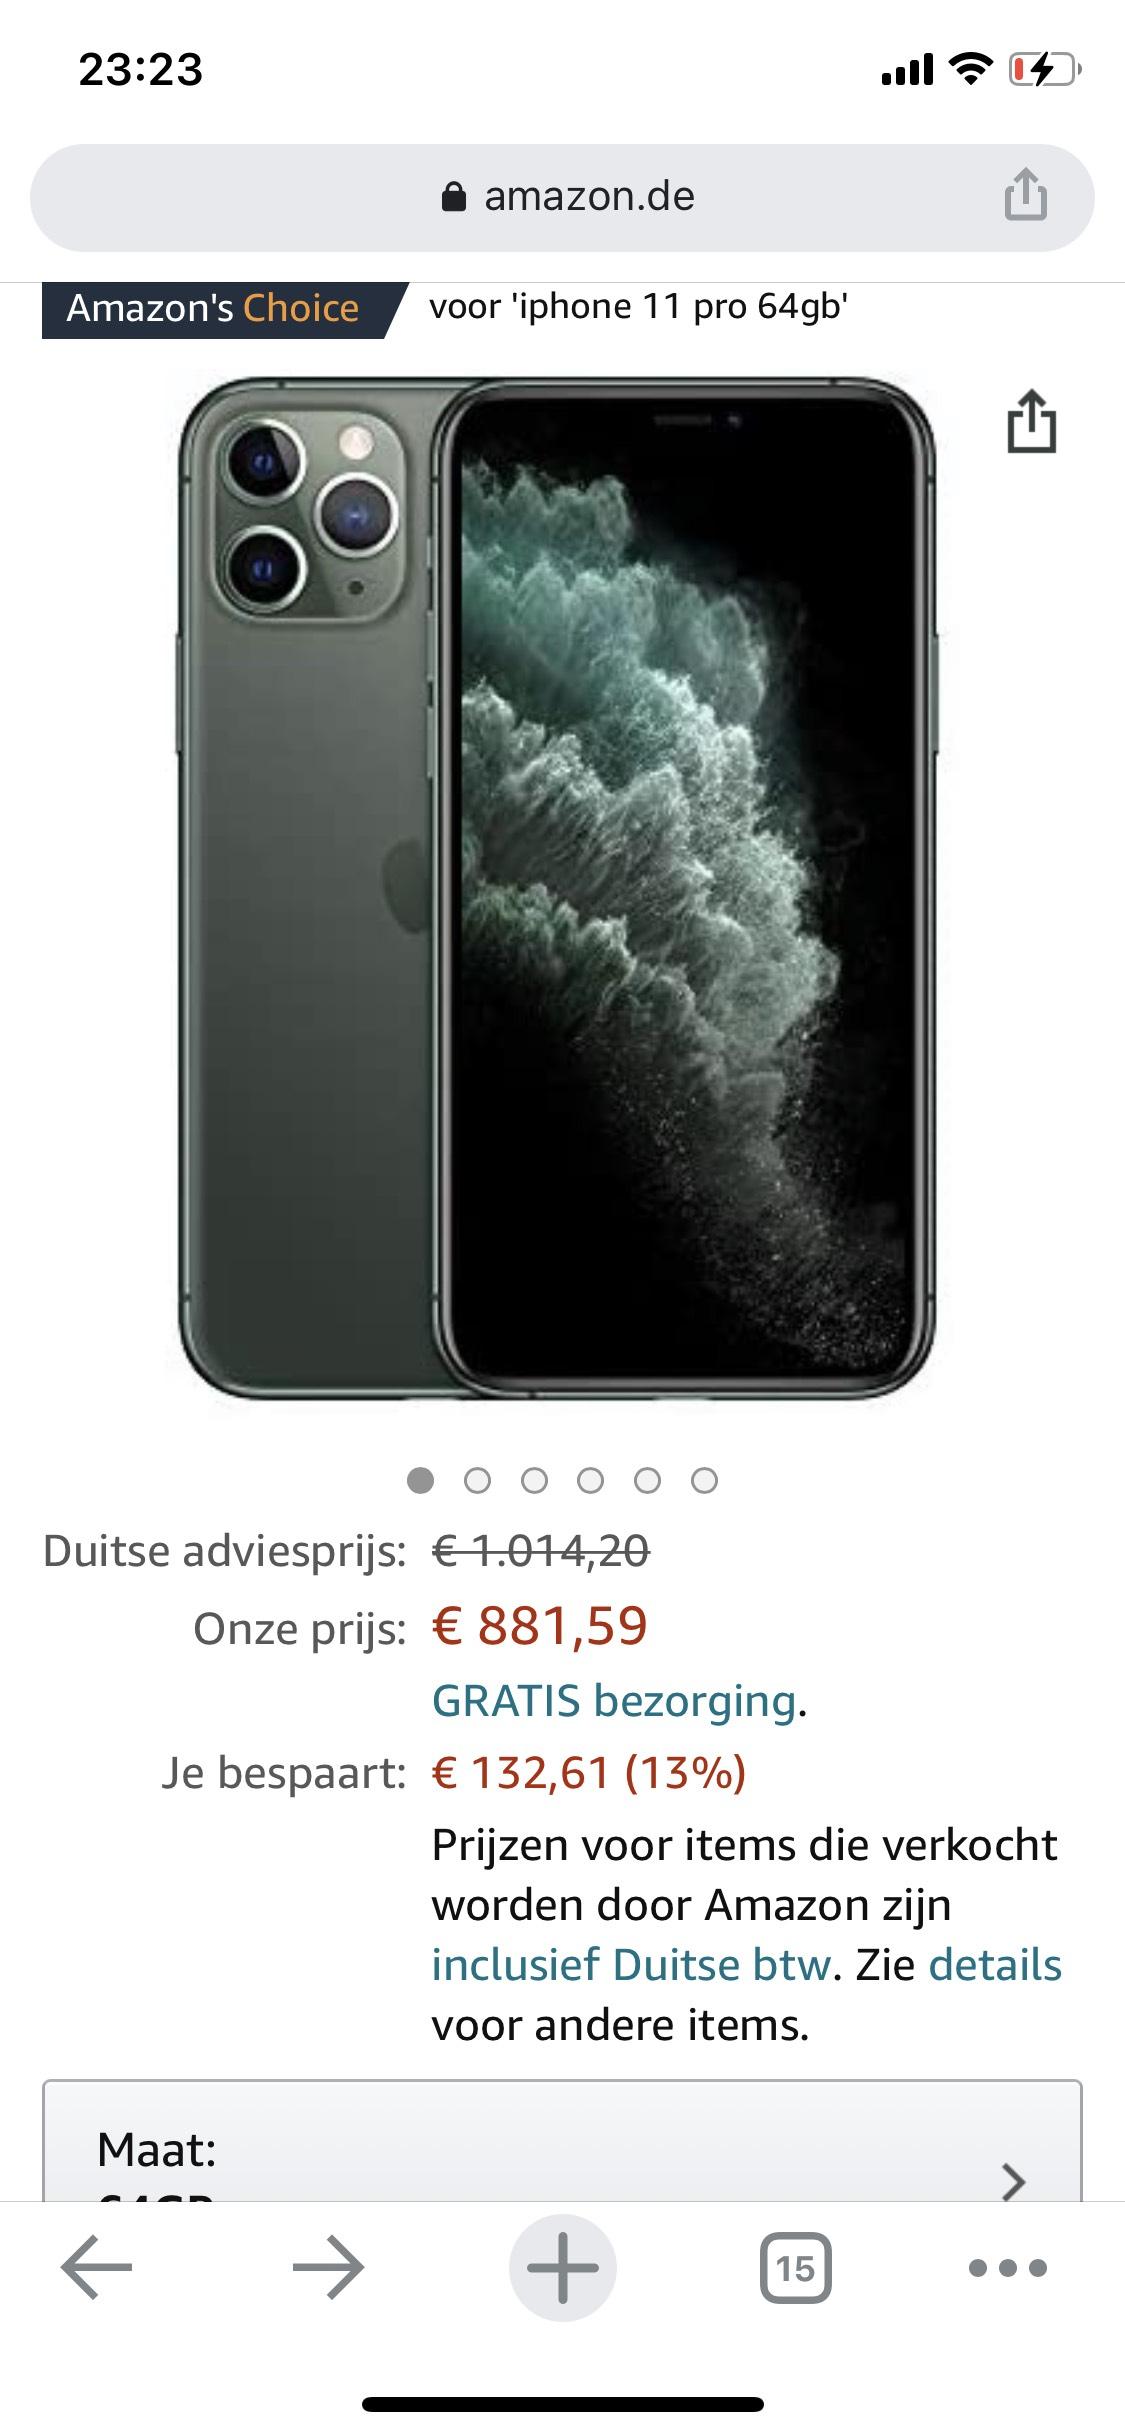 iPhone 11 Pro 64gb Middernachtgroen